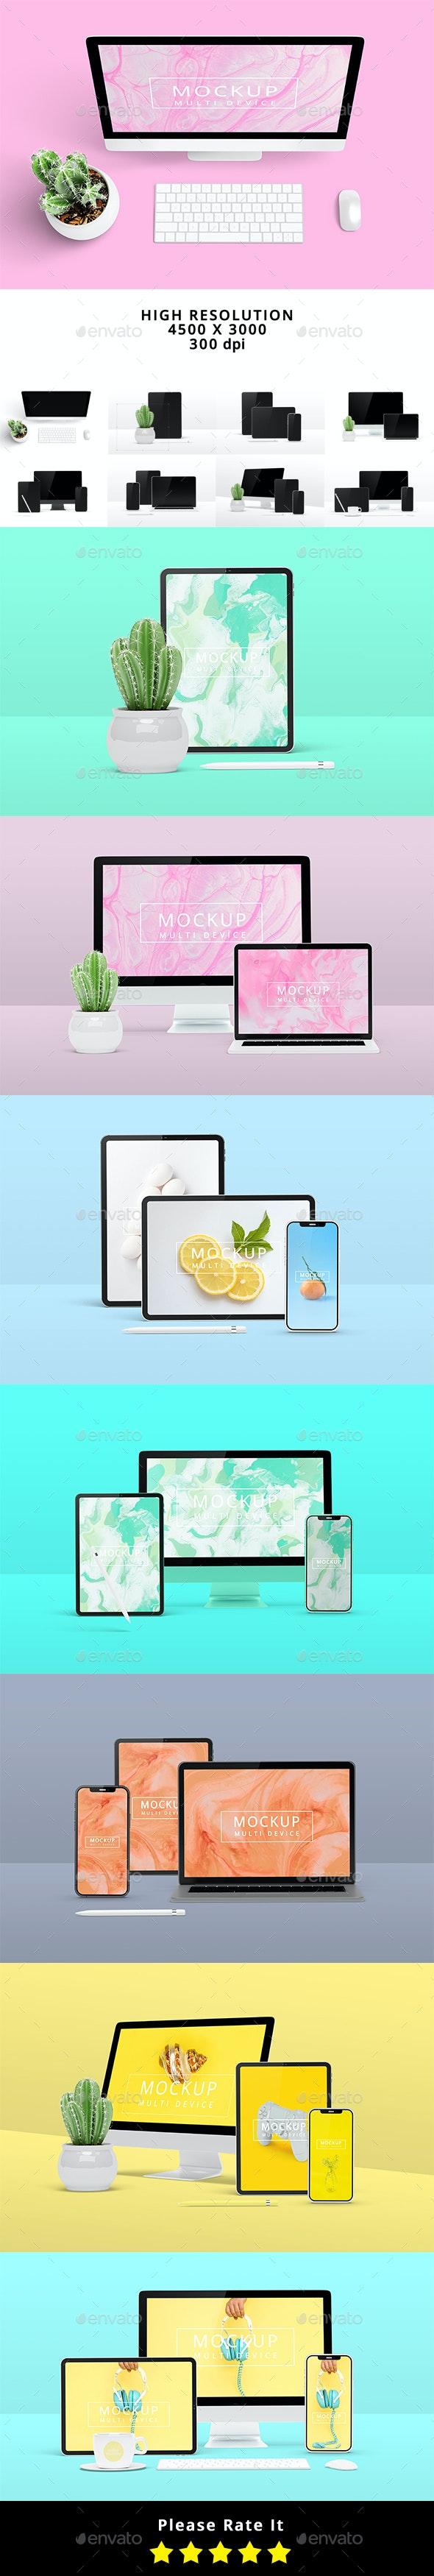 Multi Device Mockup - Scene Creator - Multiple Displays